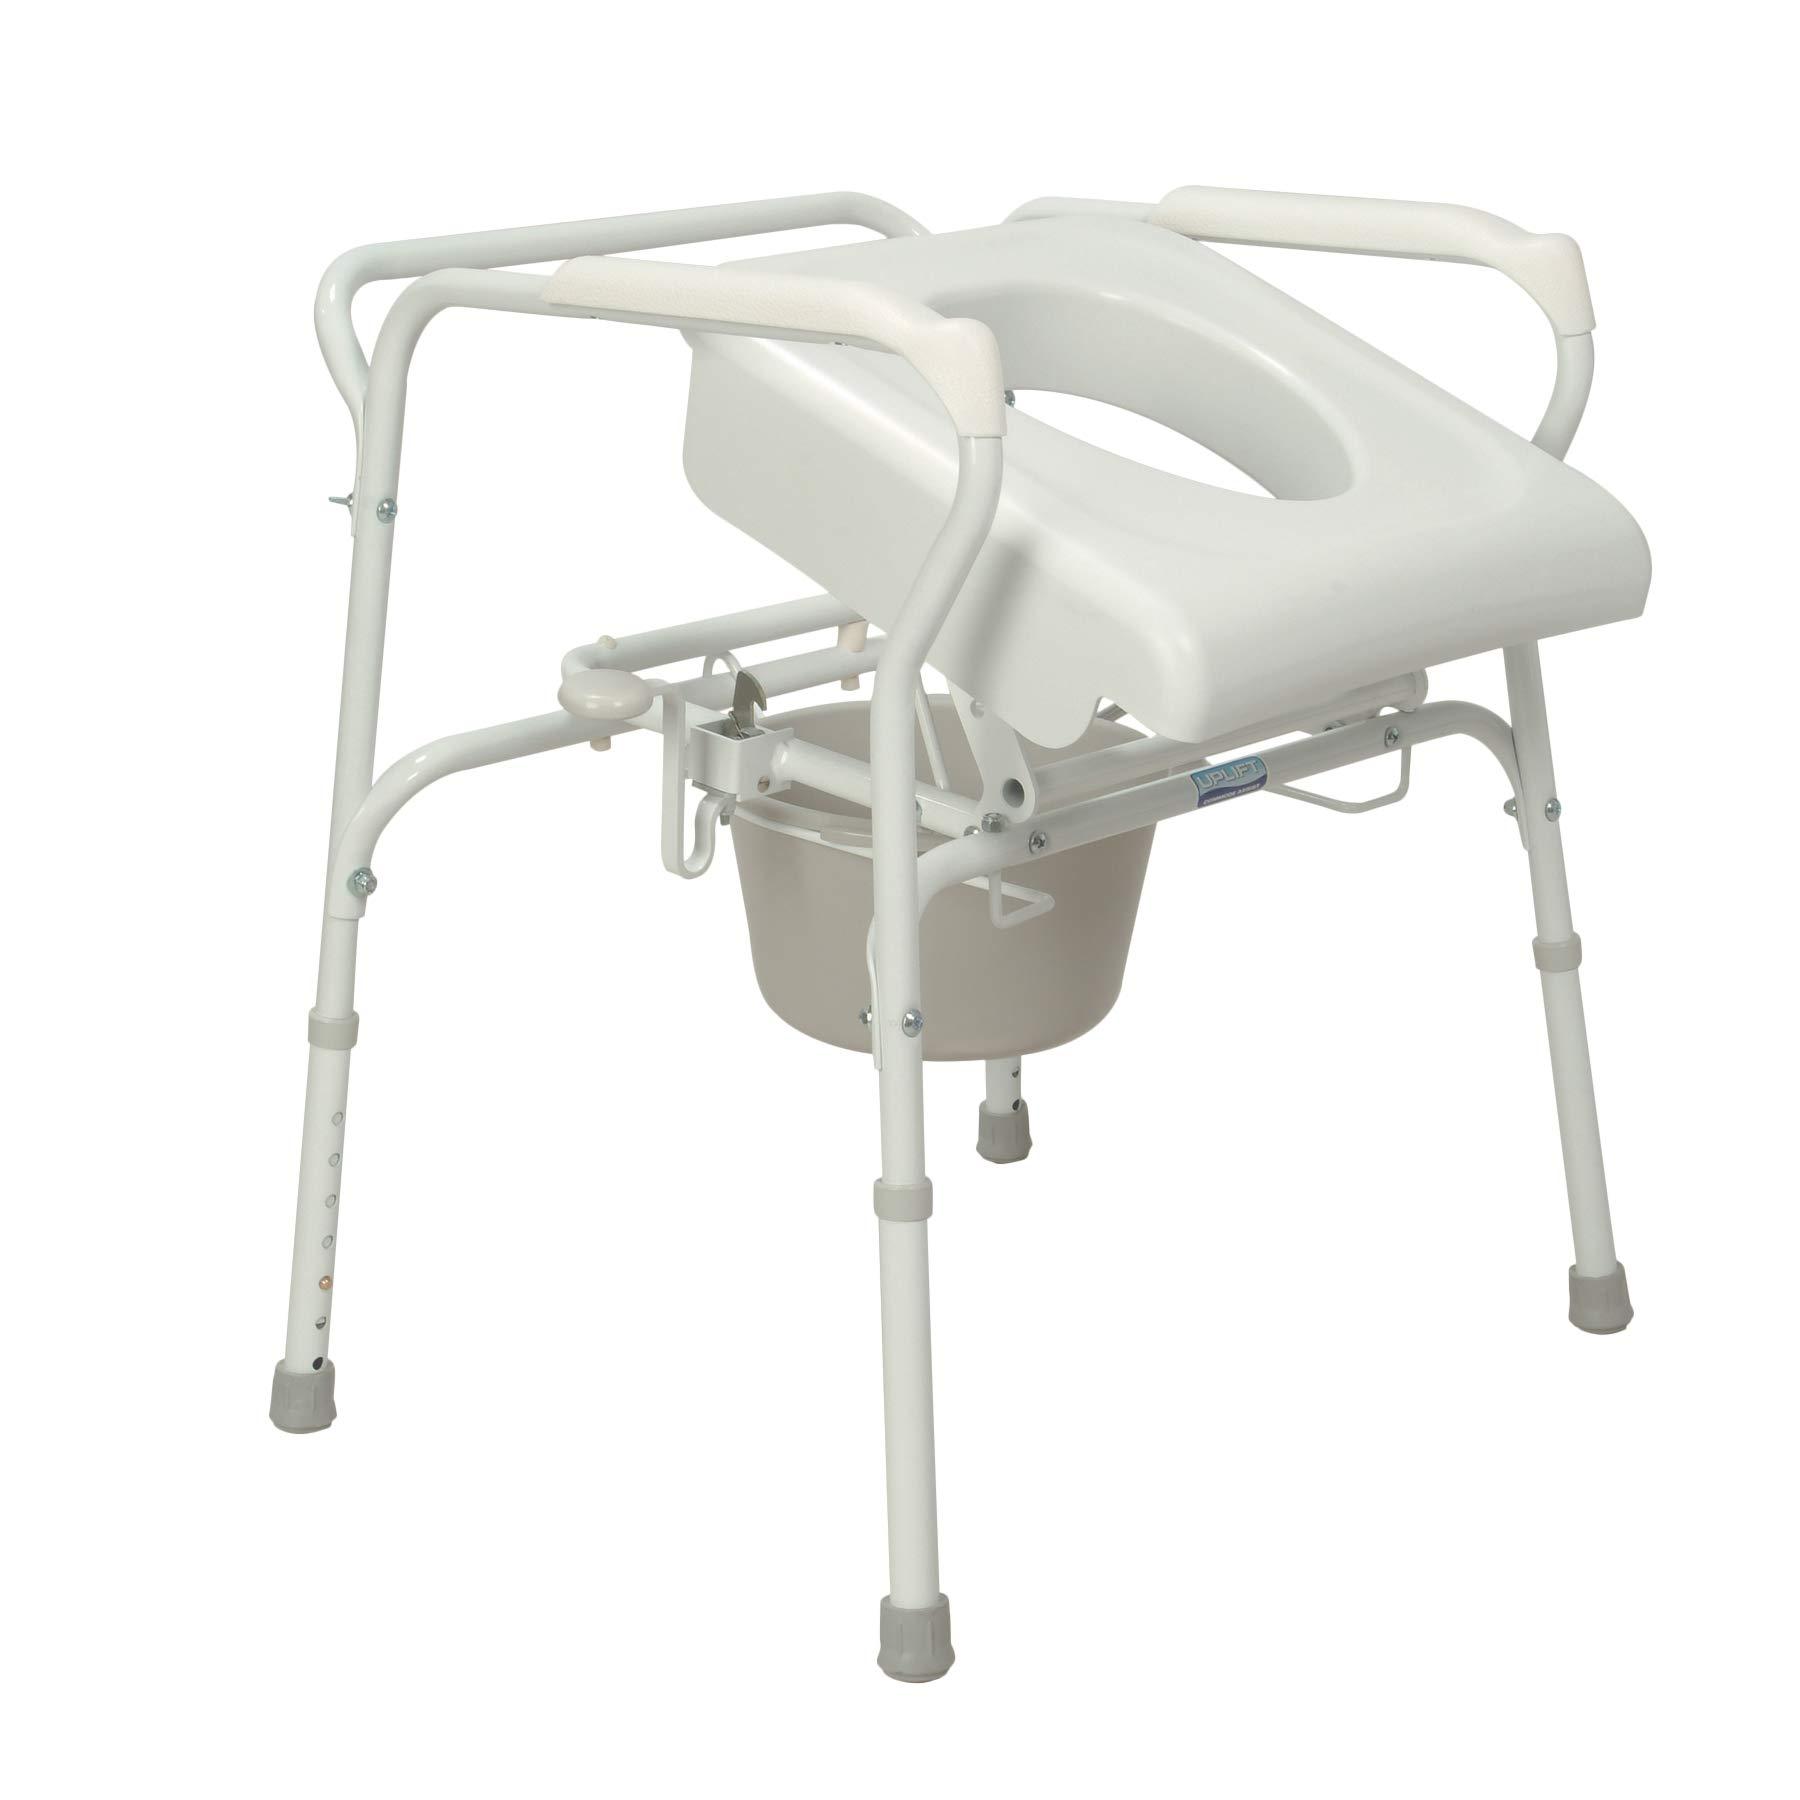 Carex Commode Seat Riser - Toilet Lift Commode Chair For Seniors, Elderly, Handicap - Auto Lifting Toilet Chair, White